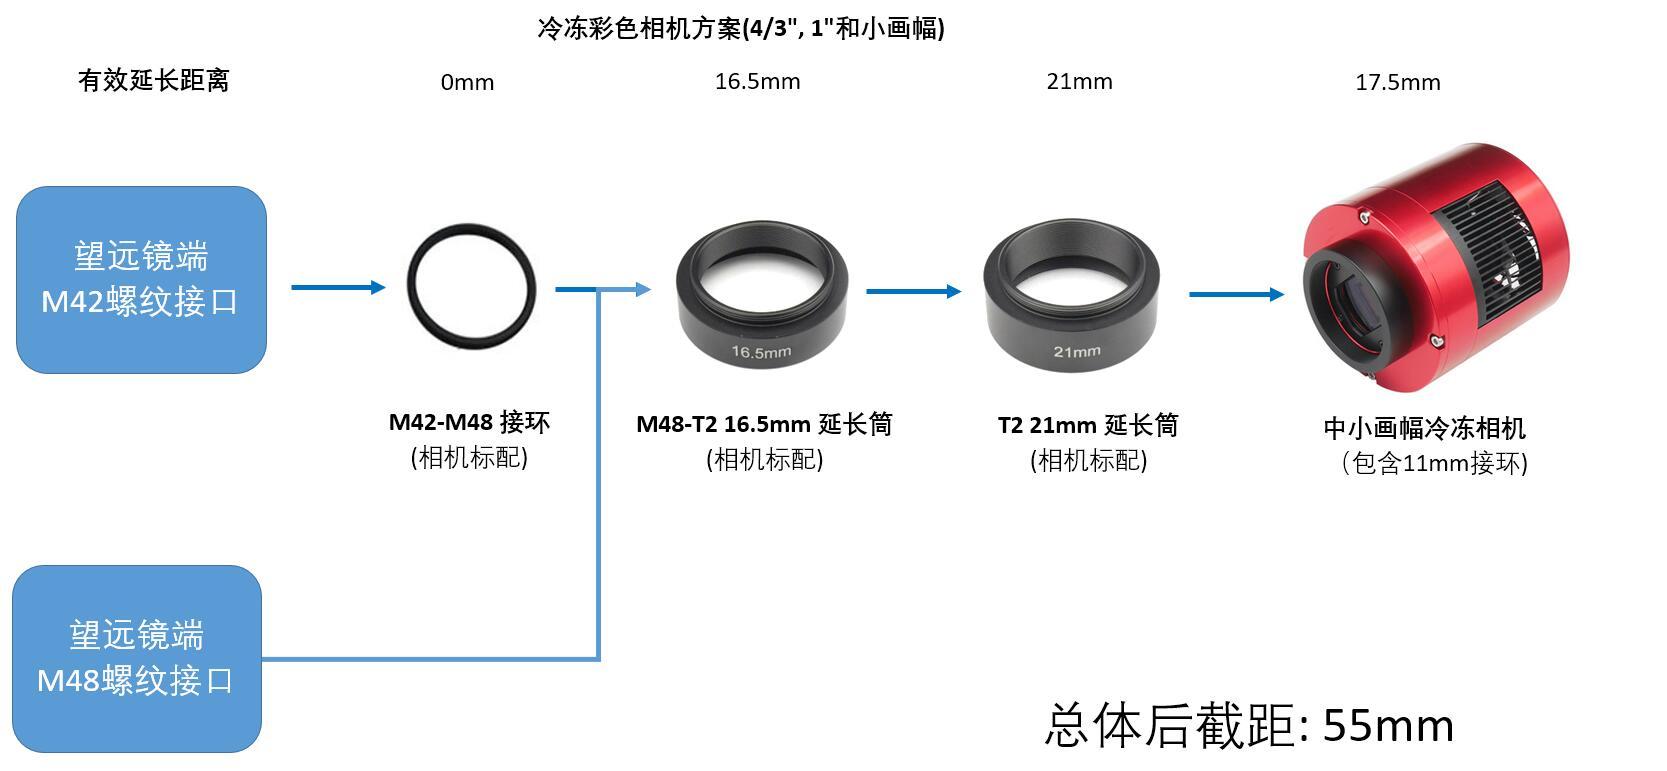 Cooled Color Camera solution(中文).jpg